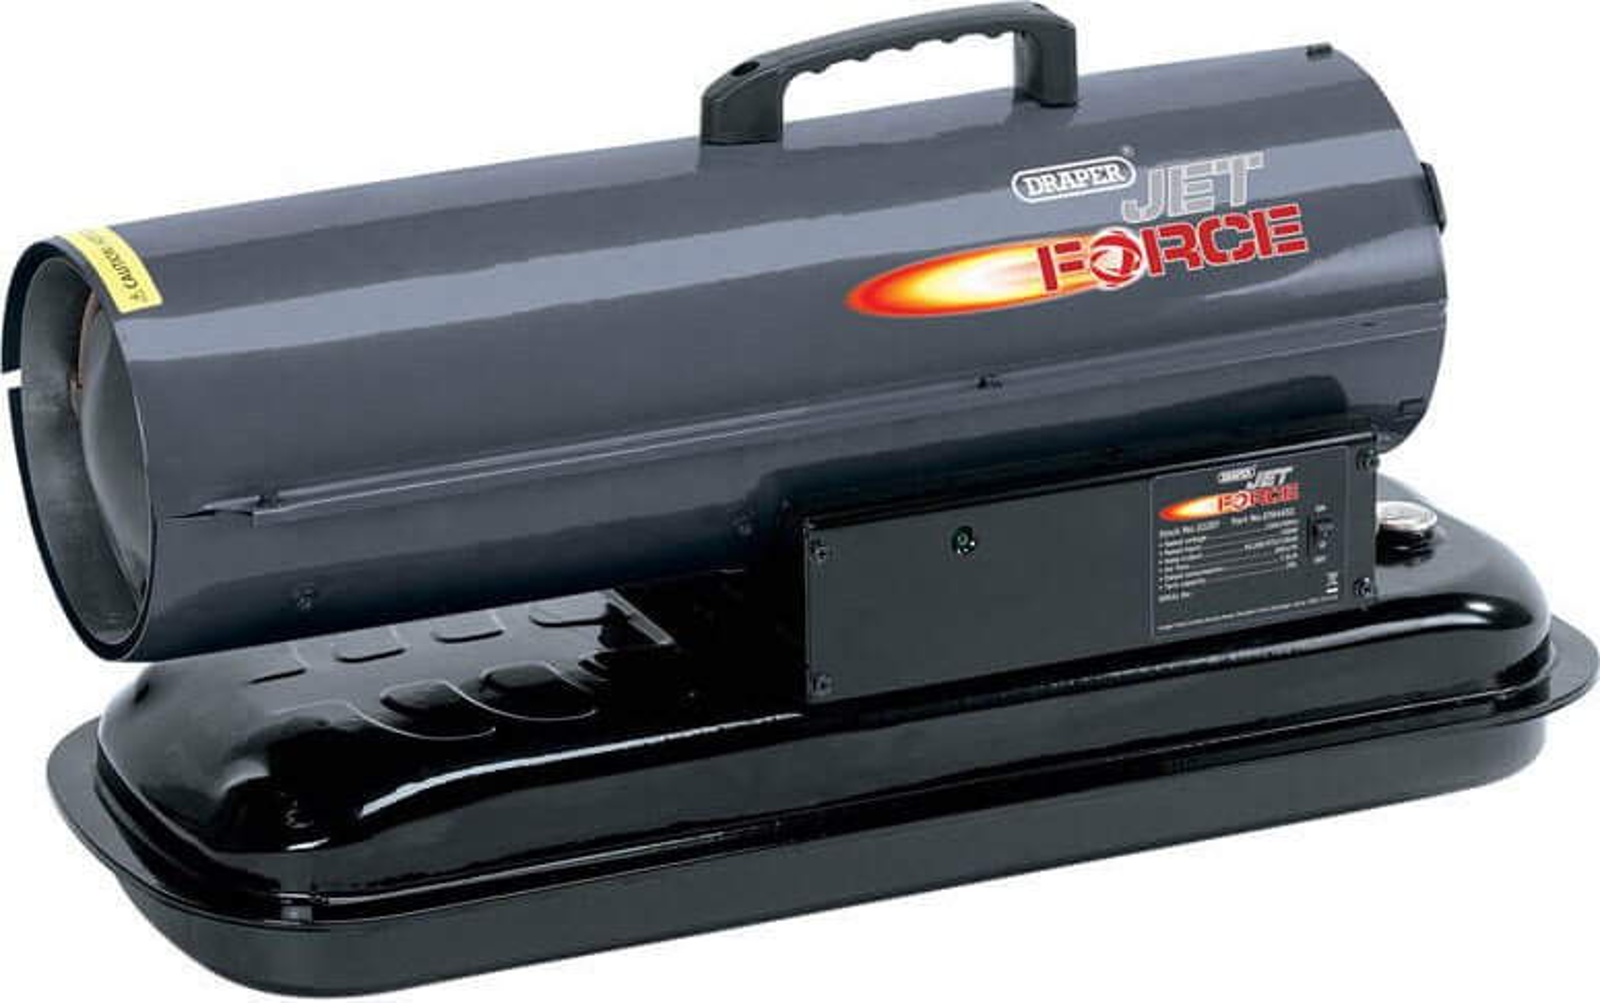 Draper DSH450 Jet Force Diesel or Paraffin Space Heater 240v